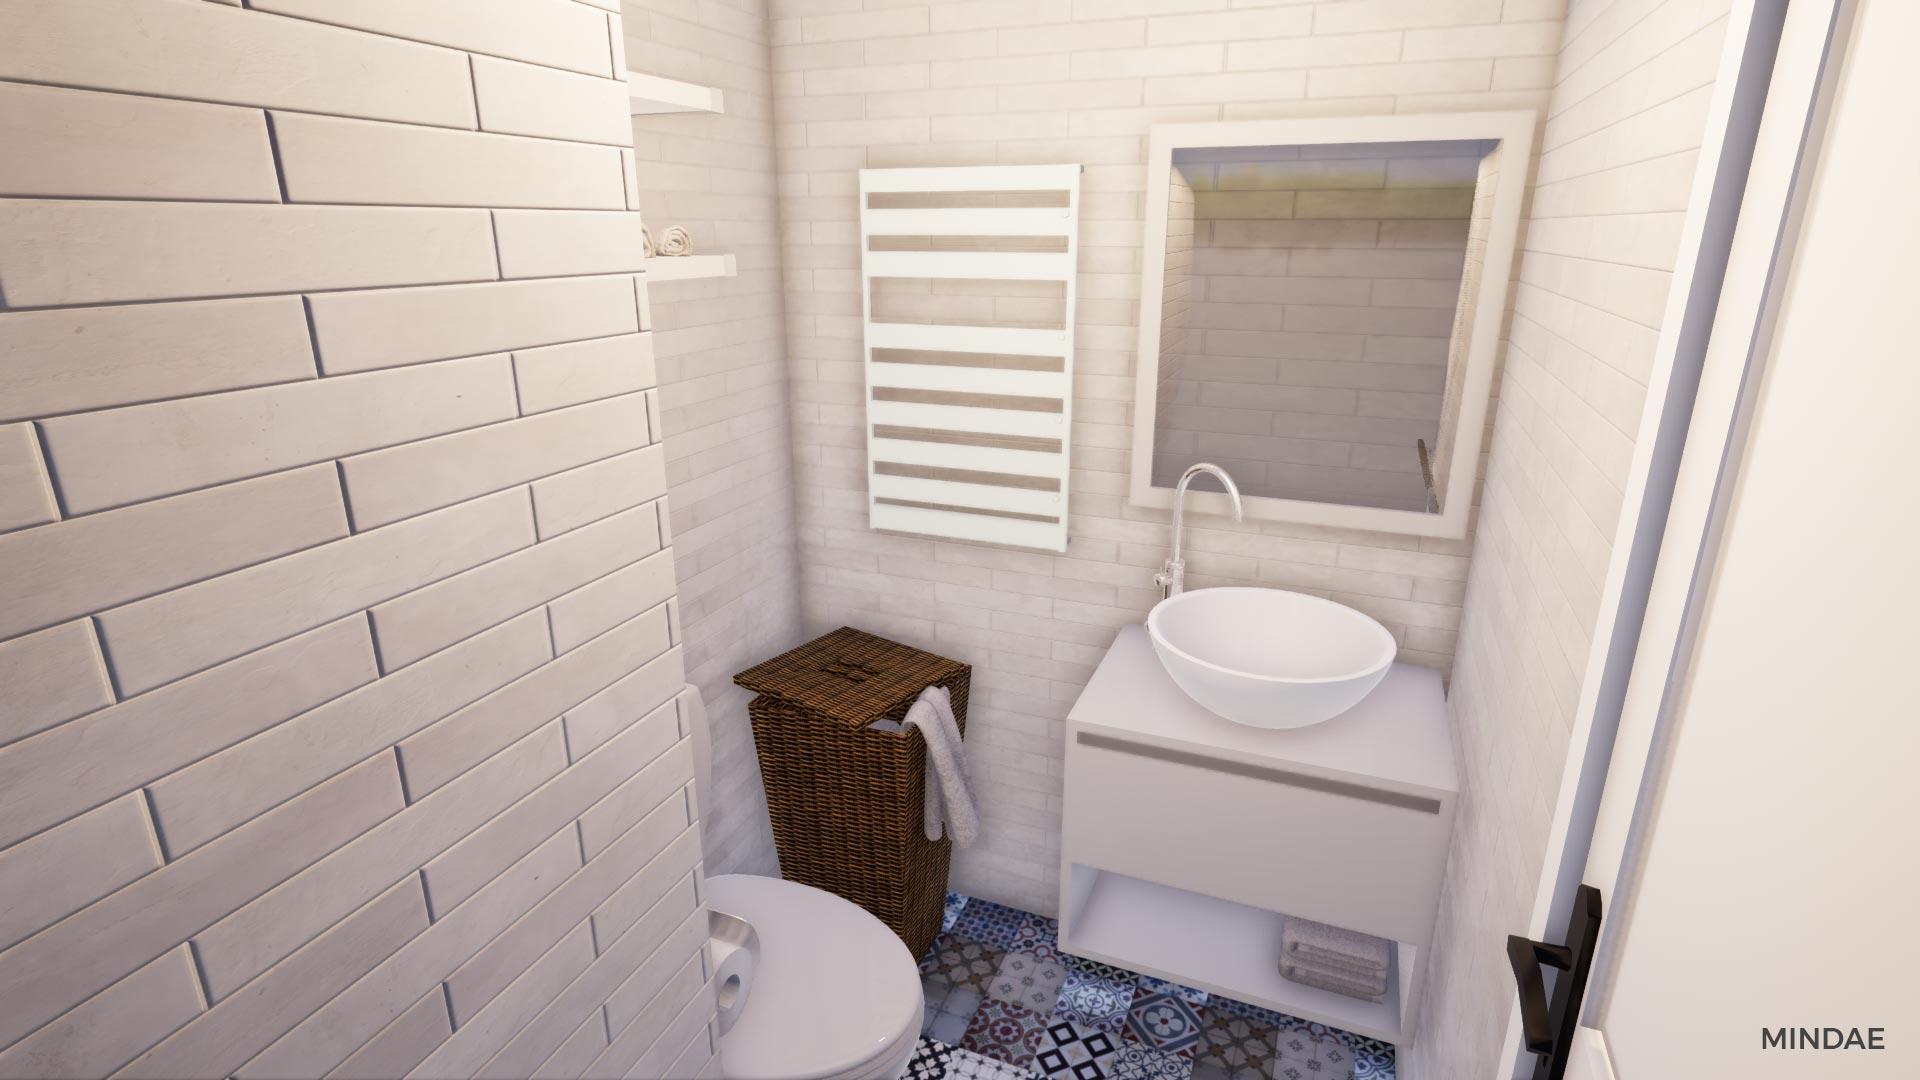 Mindae_3D_as_immobilier_projet_A_garage_duplex_studio_investisseur_caen-(4)